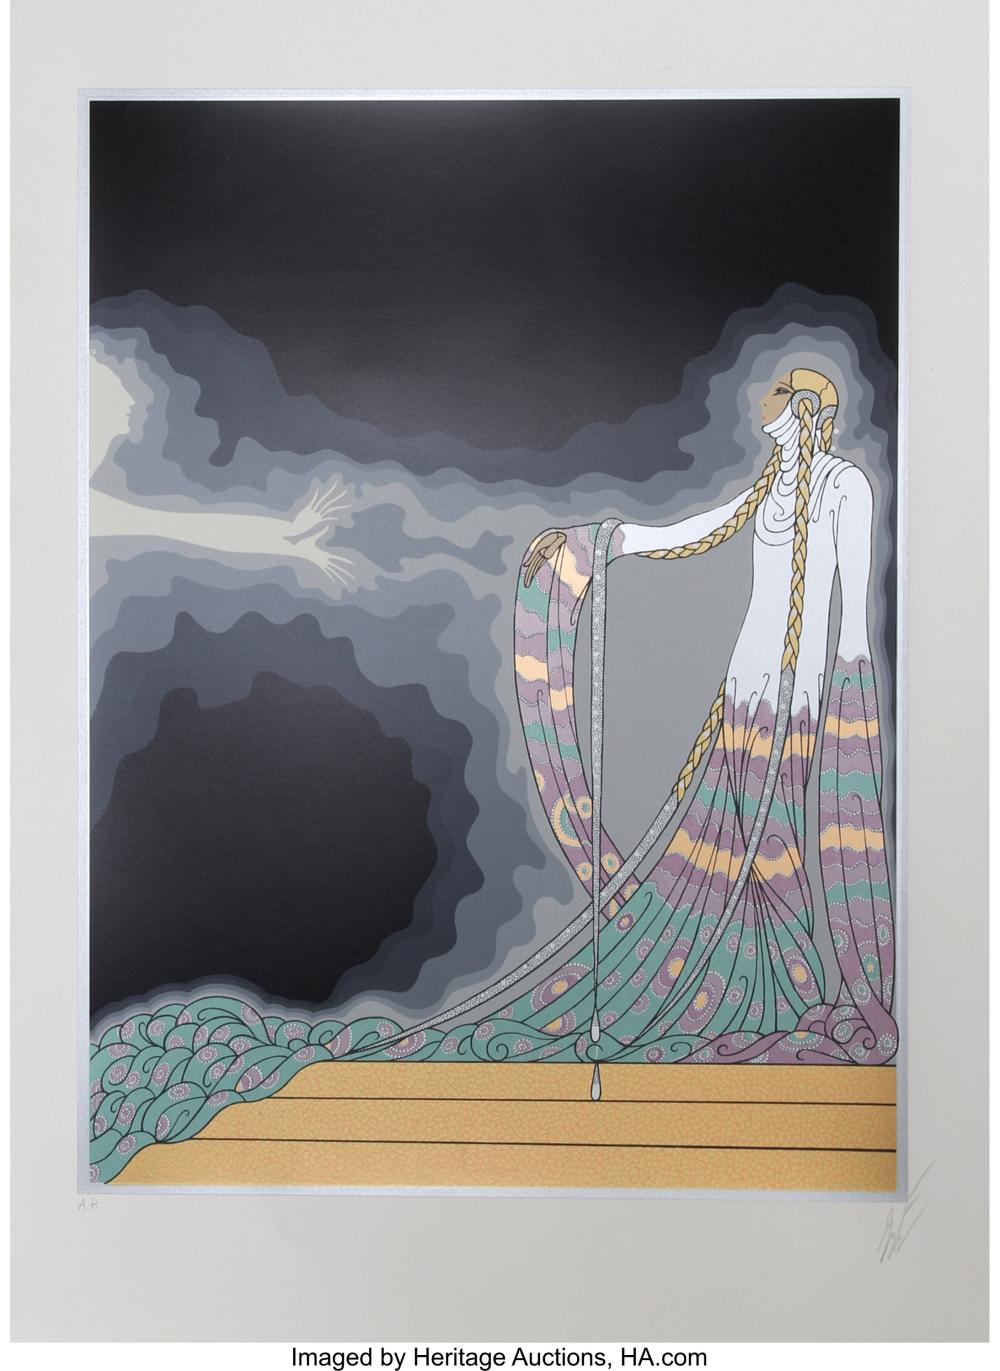 Lot 21342: Erté (Romain de Tirtoff) (1892-1990) Melisande, from At the Theater Suite, 1983